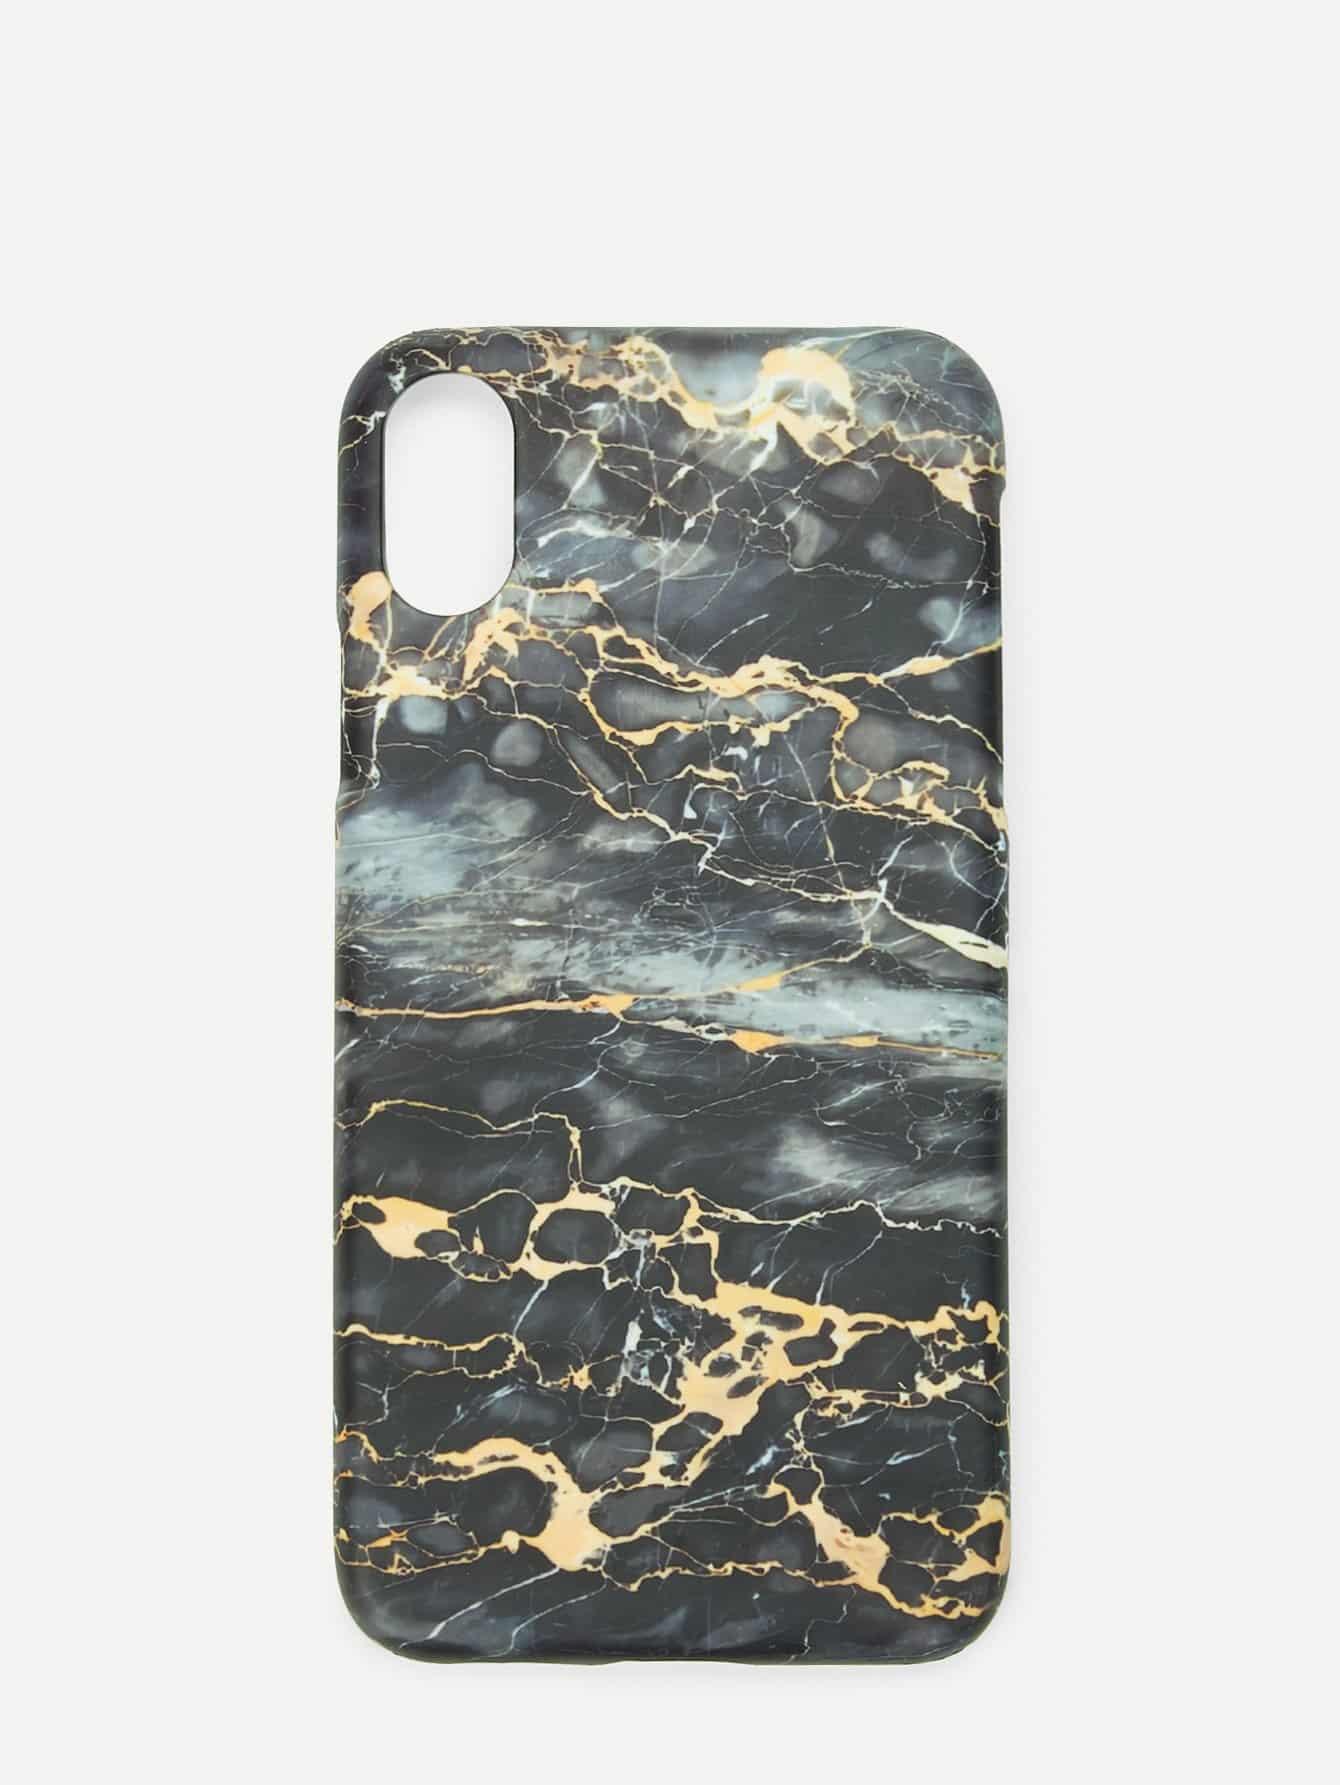 Купить Мраморный чехол для iPhone для iPhone, null, SheIn